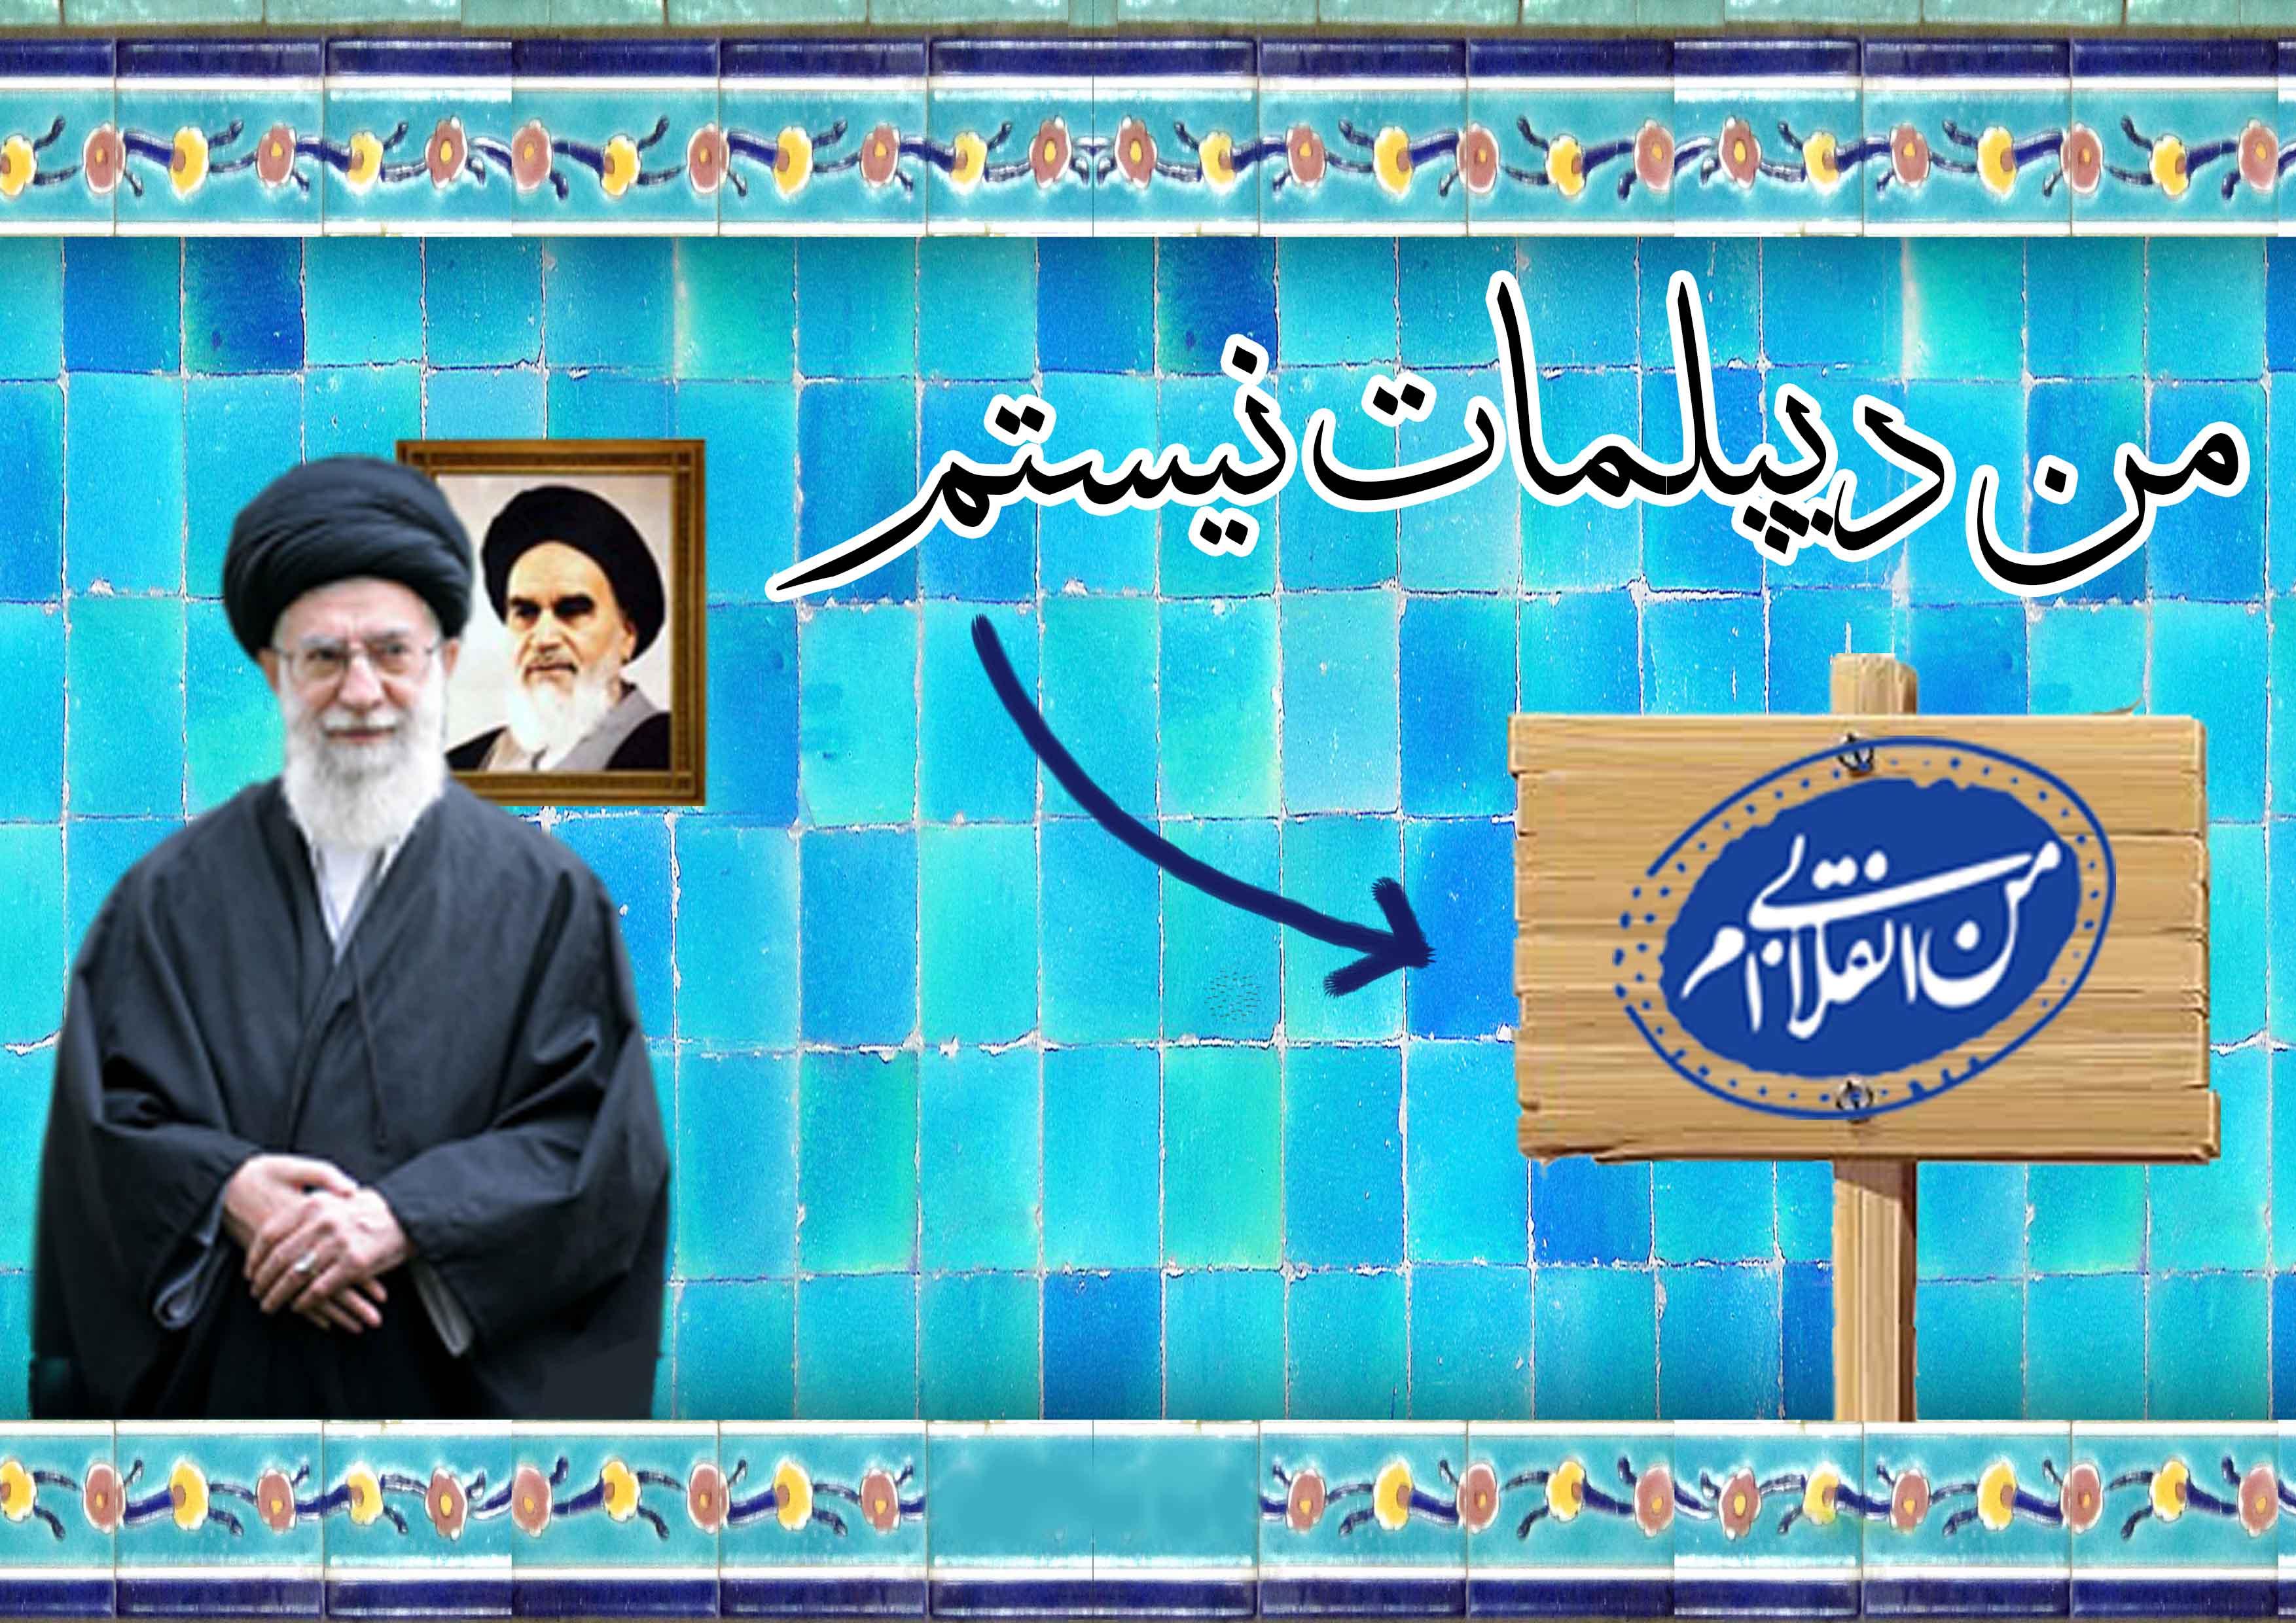 http://s5.picofile.com/file/8169353168/پوستر_من_انقلابی_ام_2.jpg